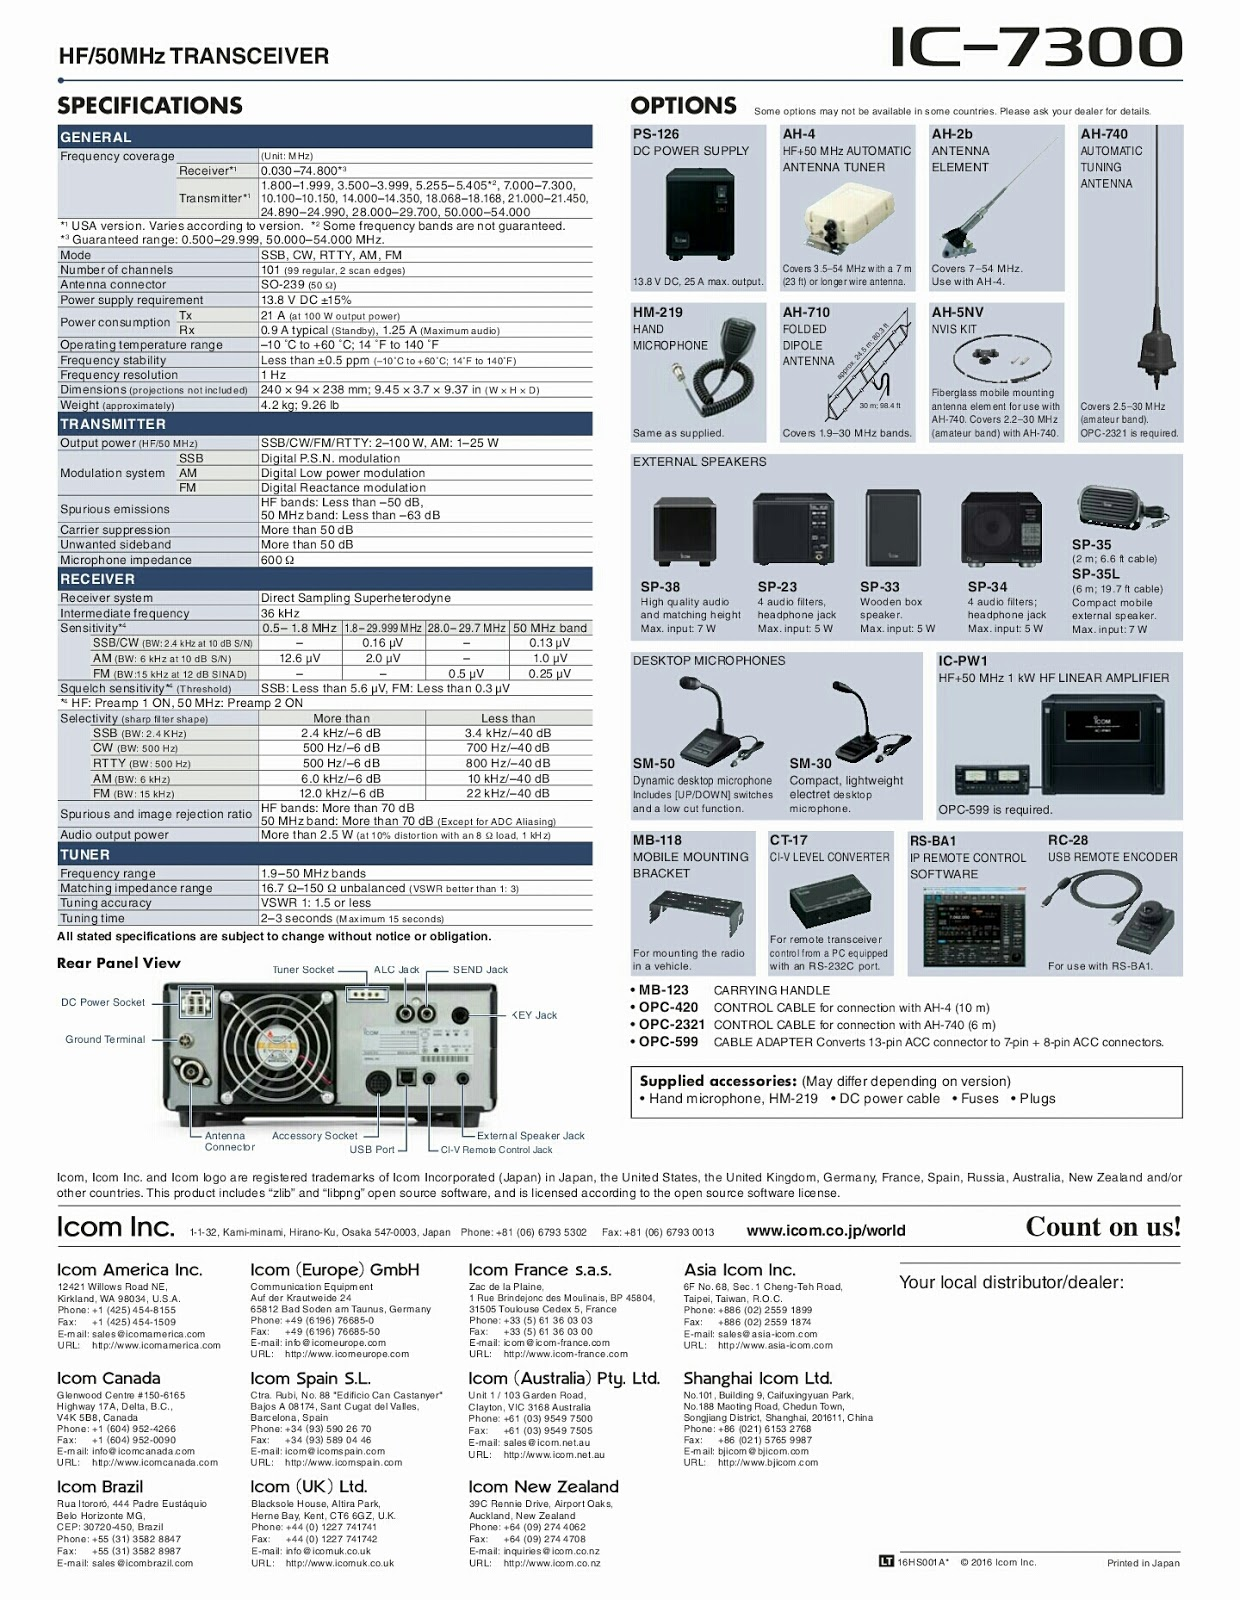 Download Icom 7300 Manual